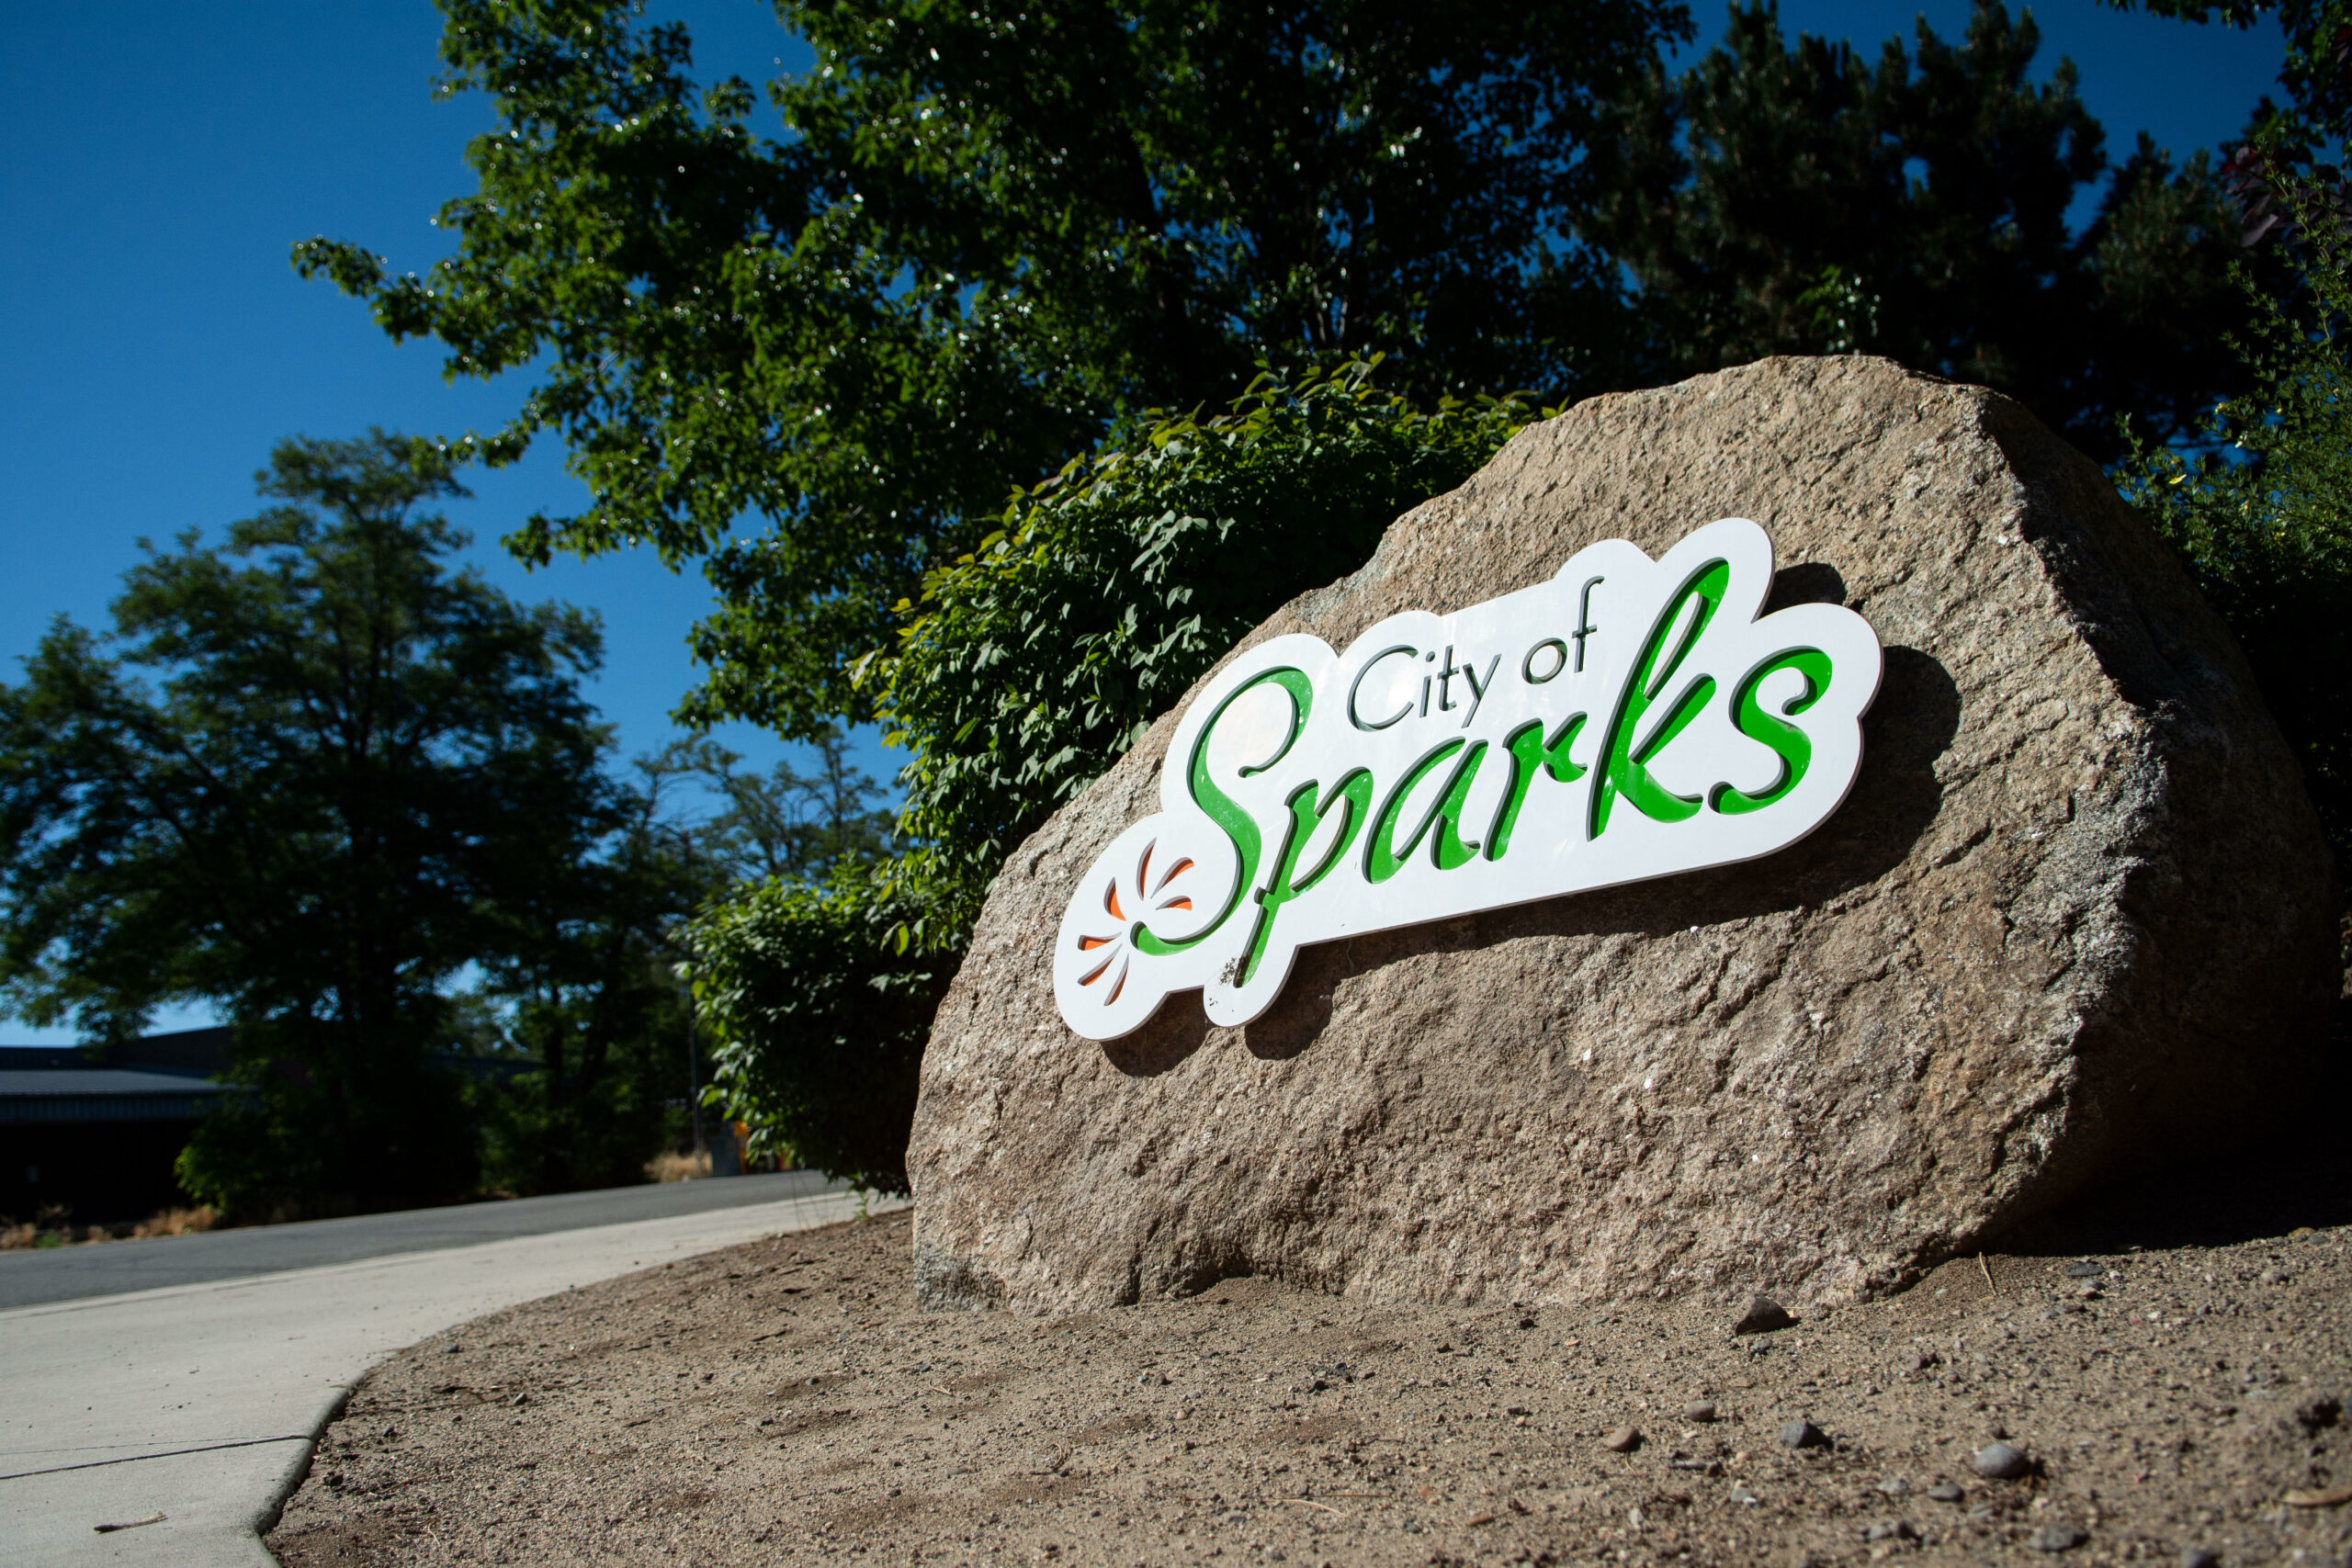 City of Sparks signage